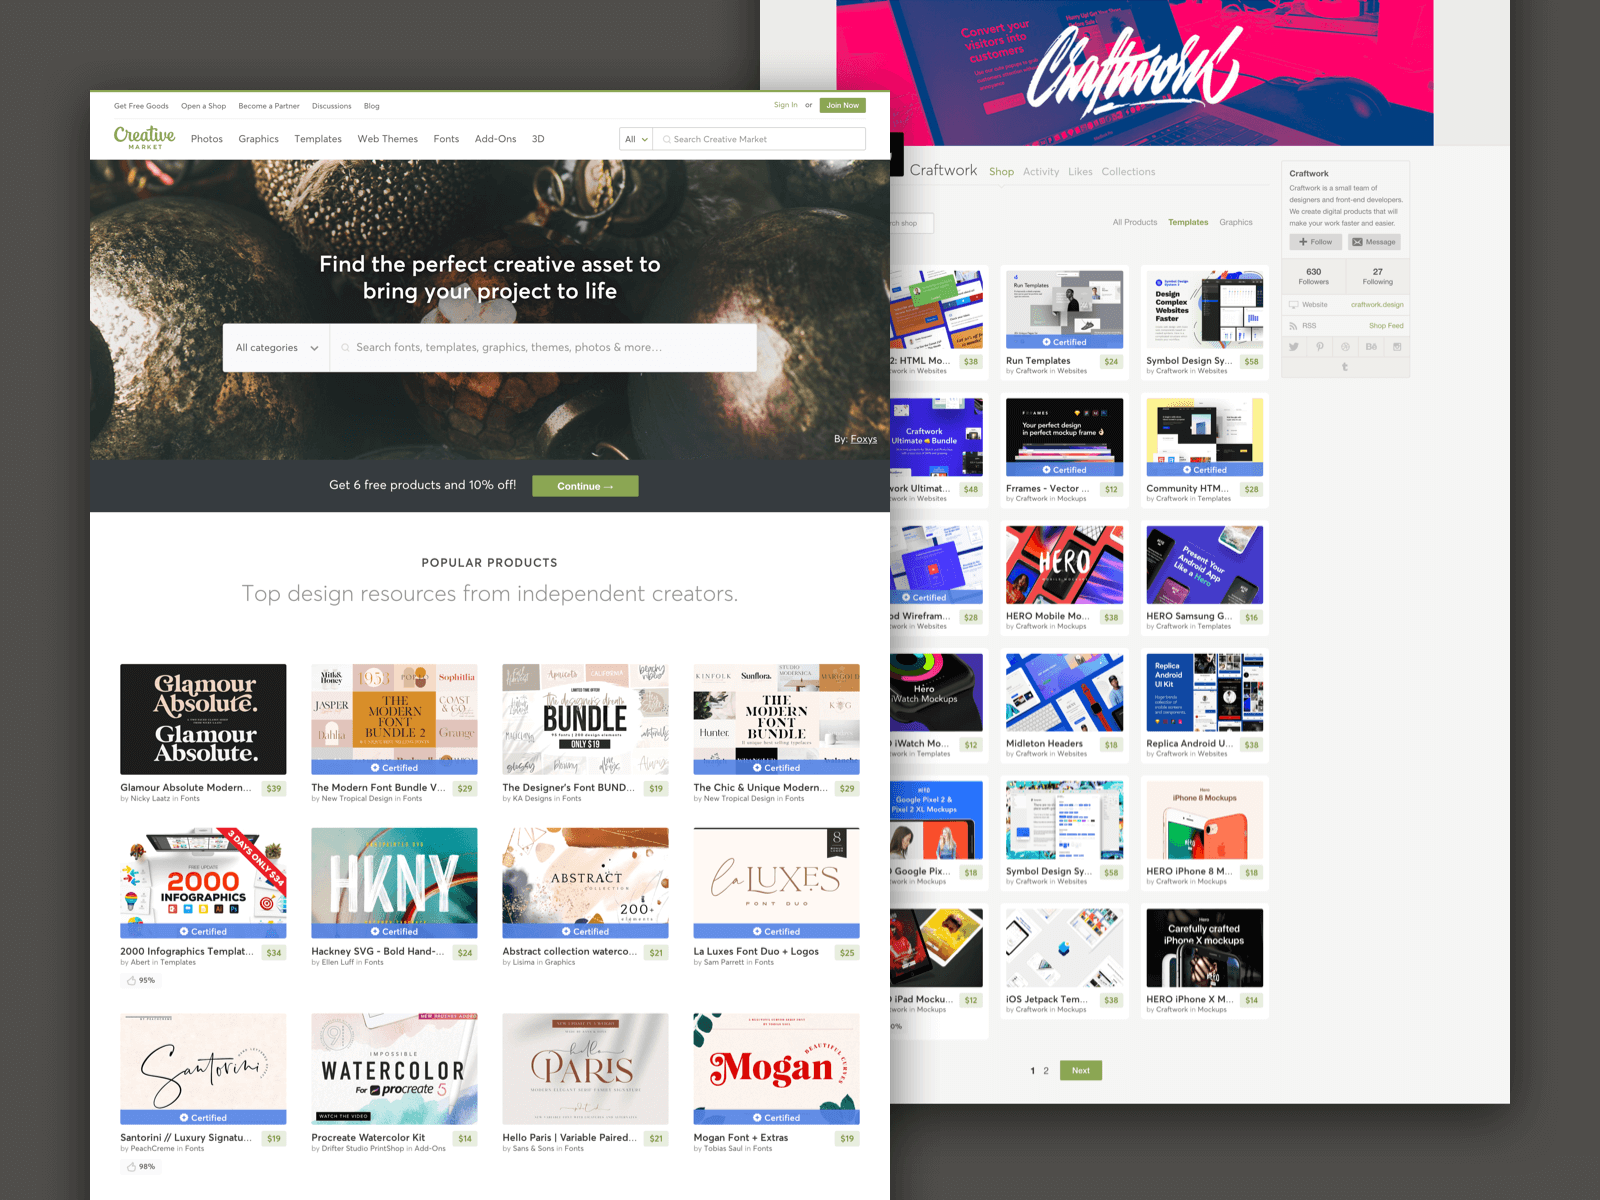 Screenshot of the Creative Market website